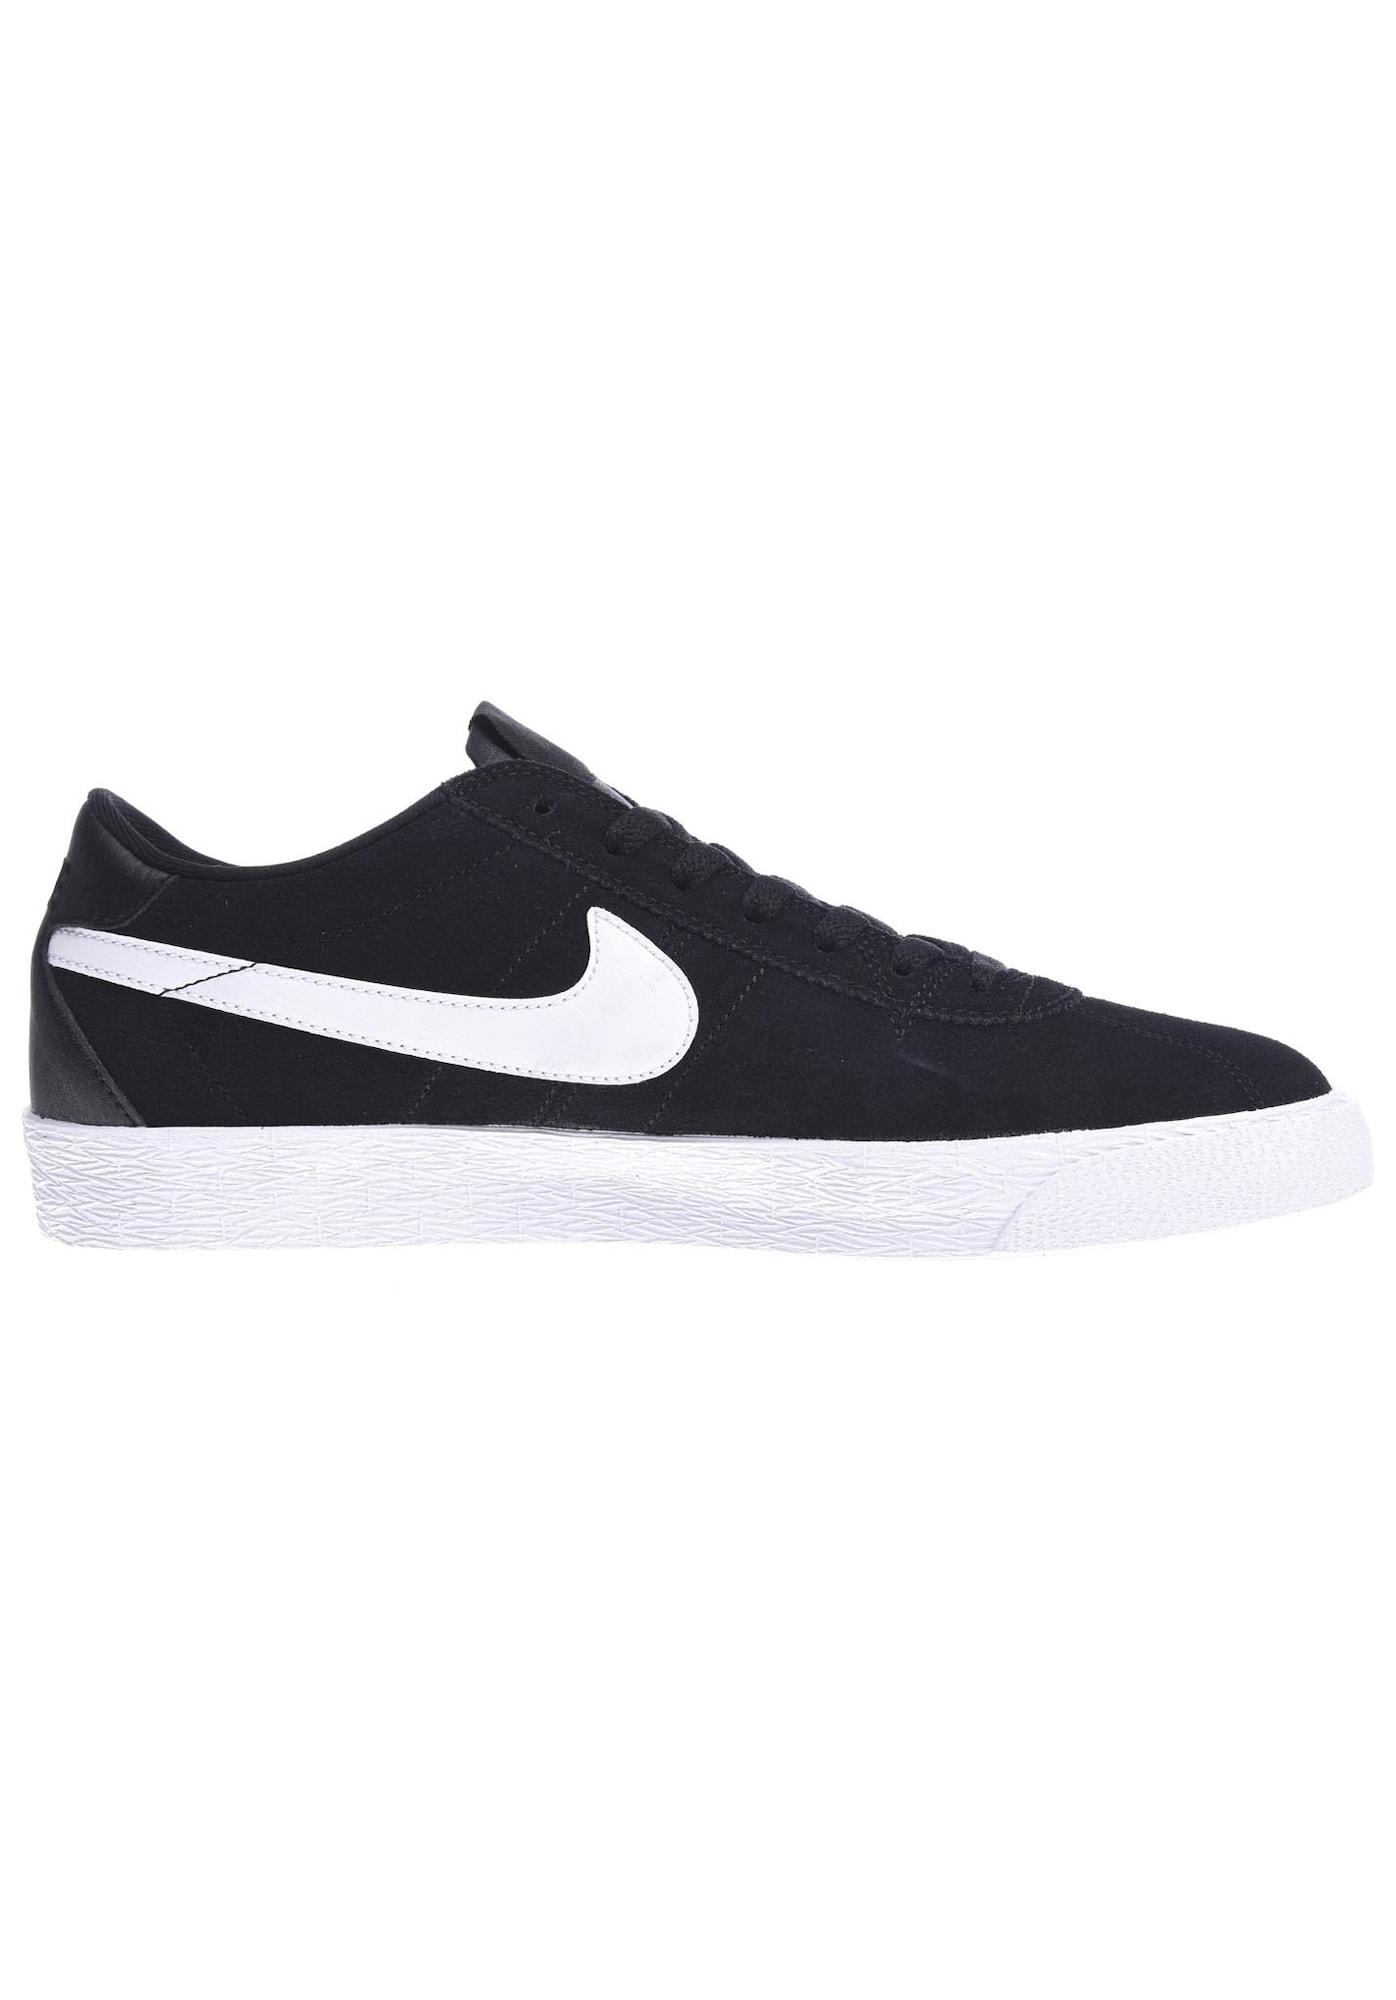 Nike Herren Sneaker Nike Bruin günstig kaufen | eBay